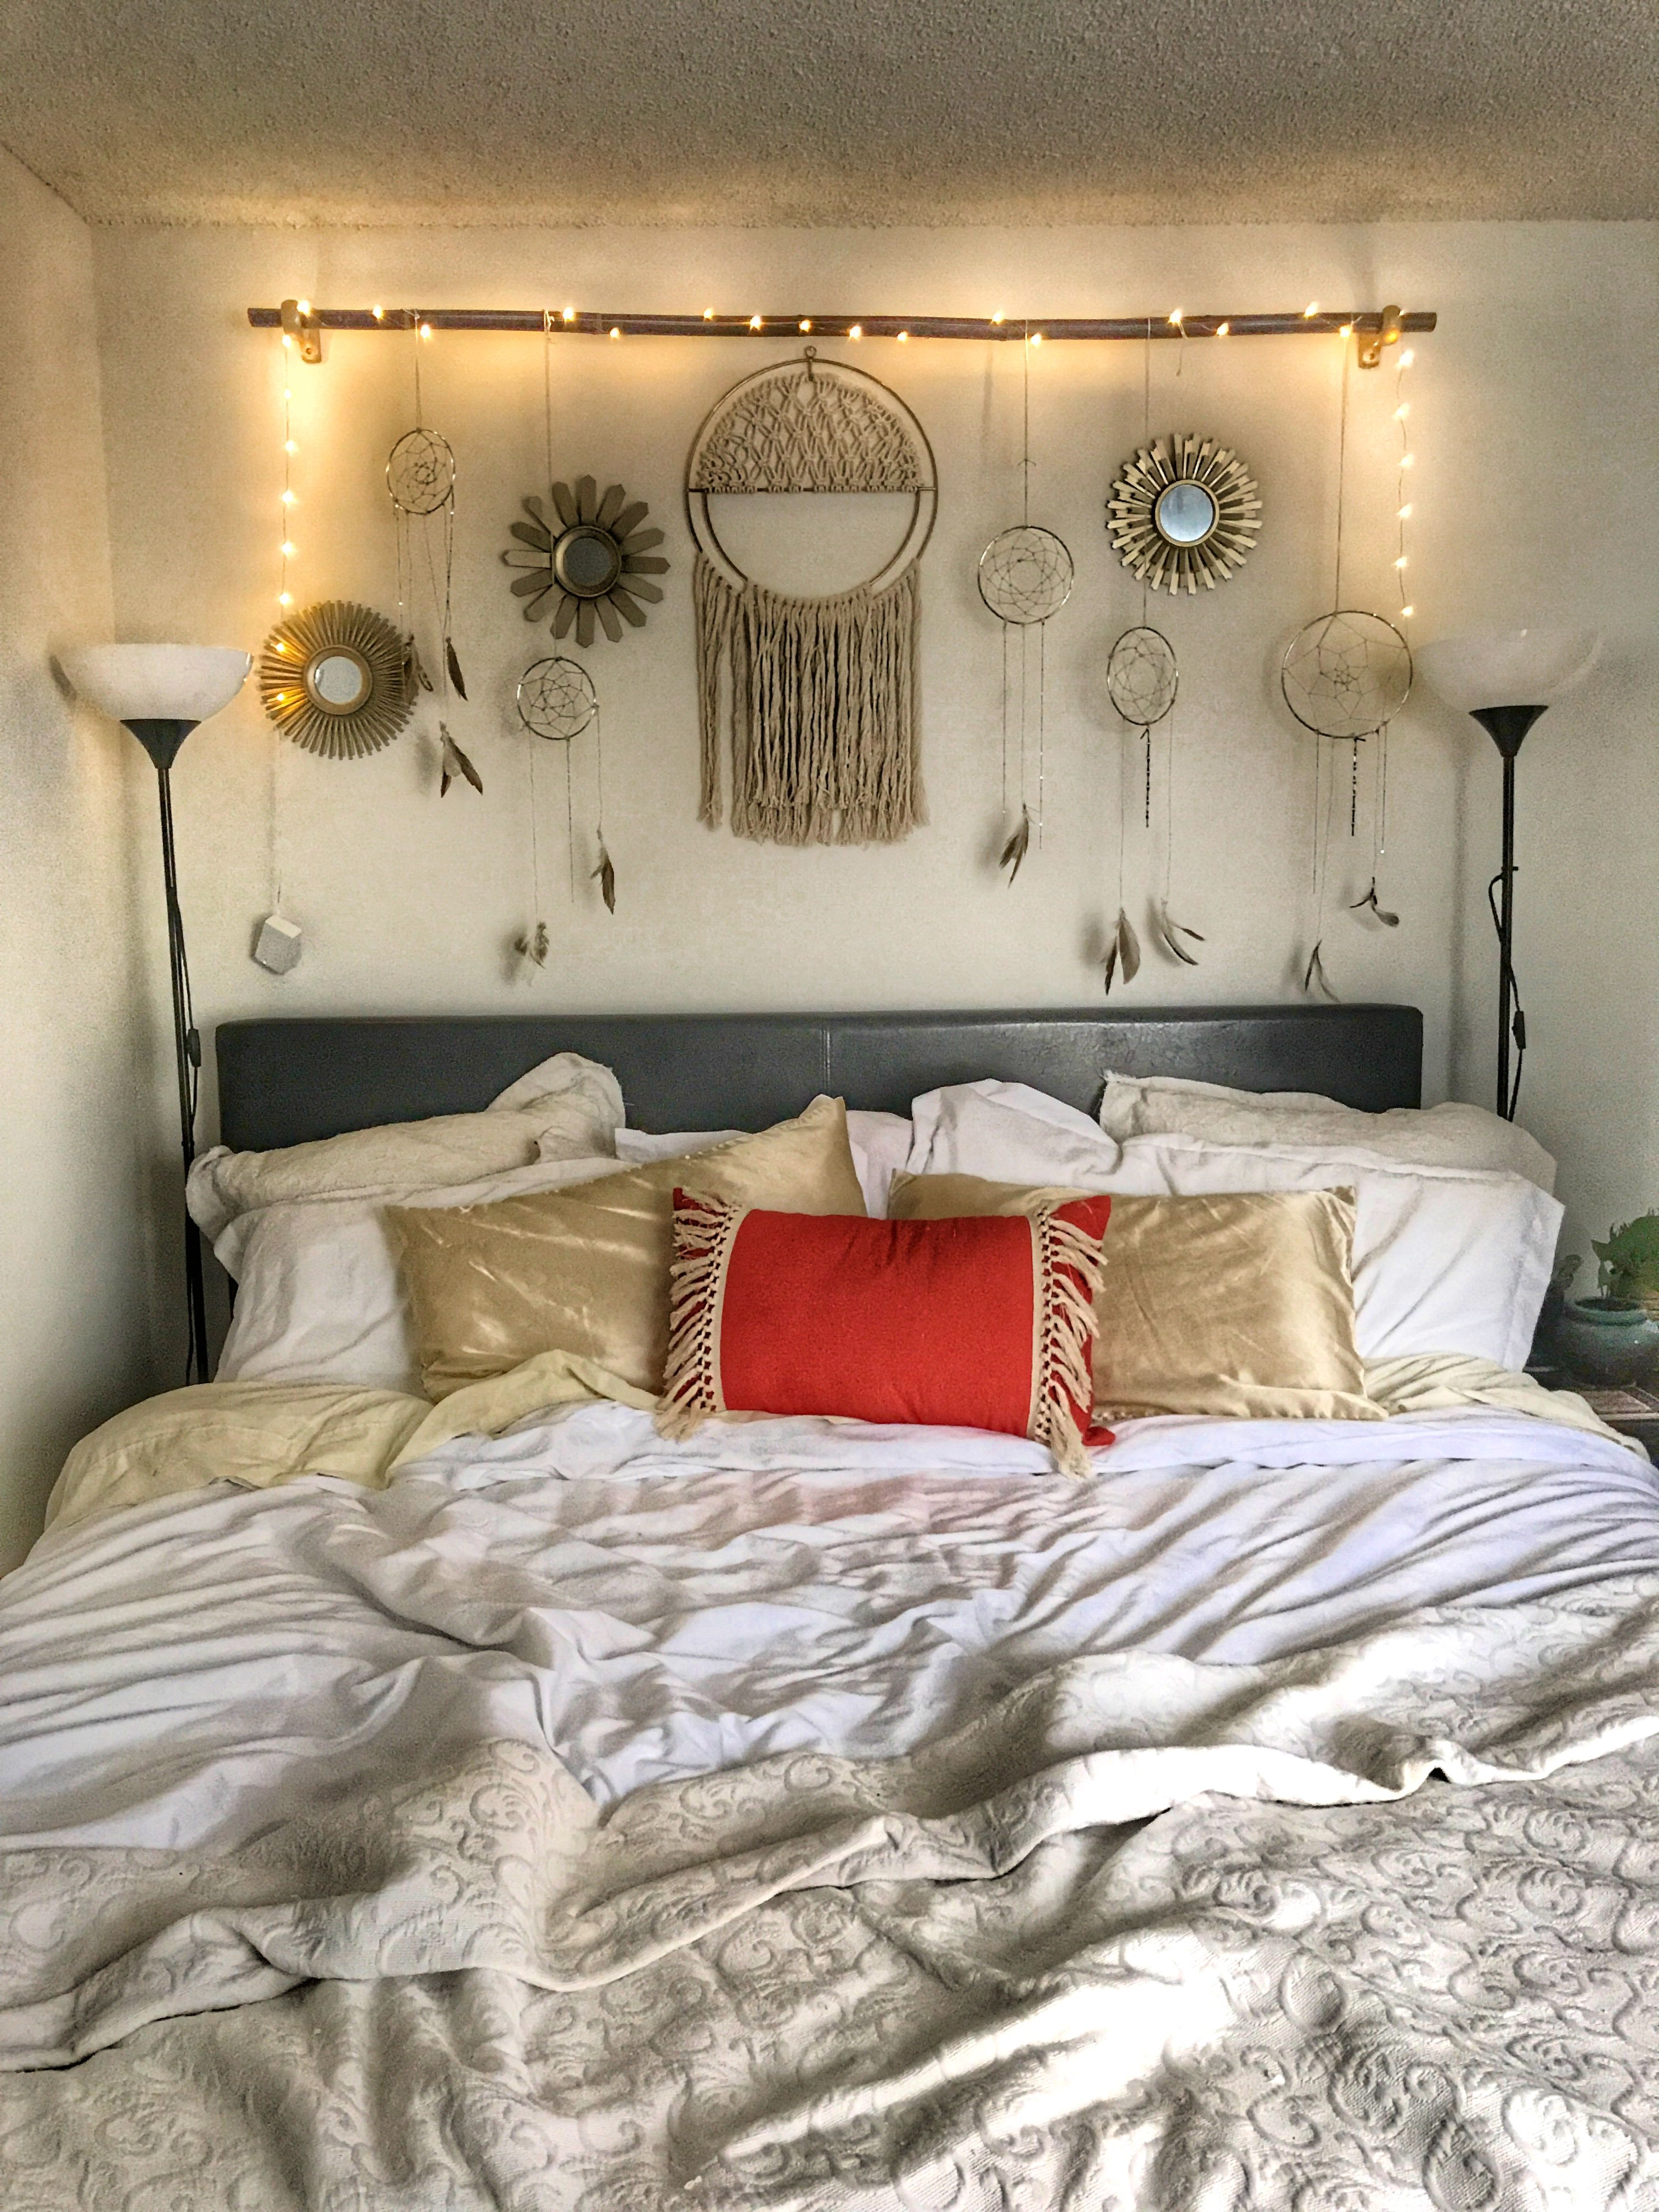 Dreamcatcher headboard  Small bedroom decor, Bedroom decor cozy